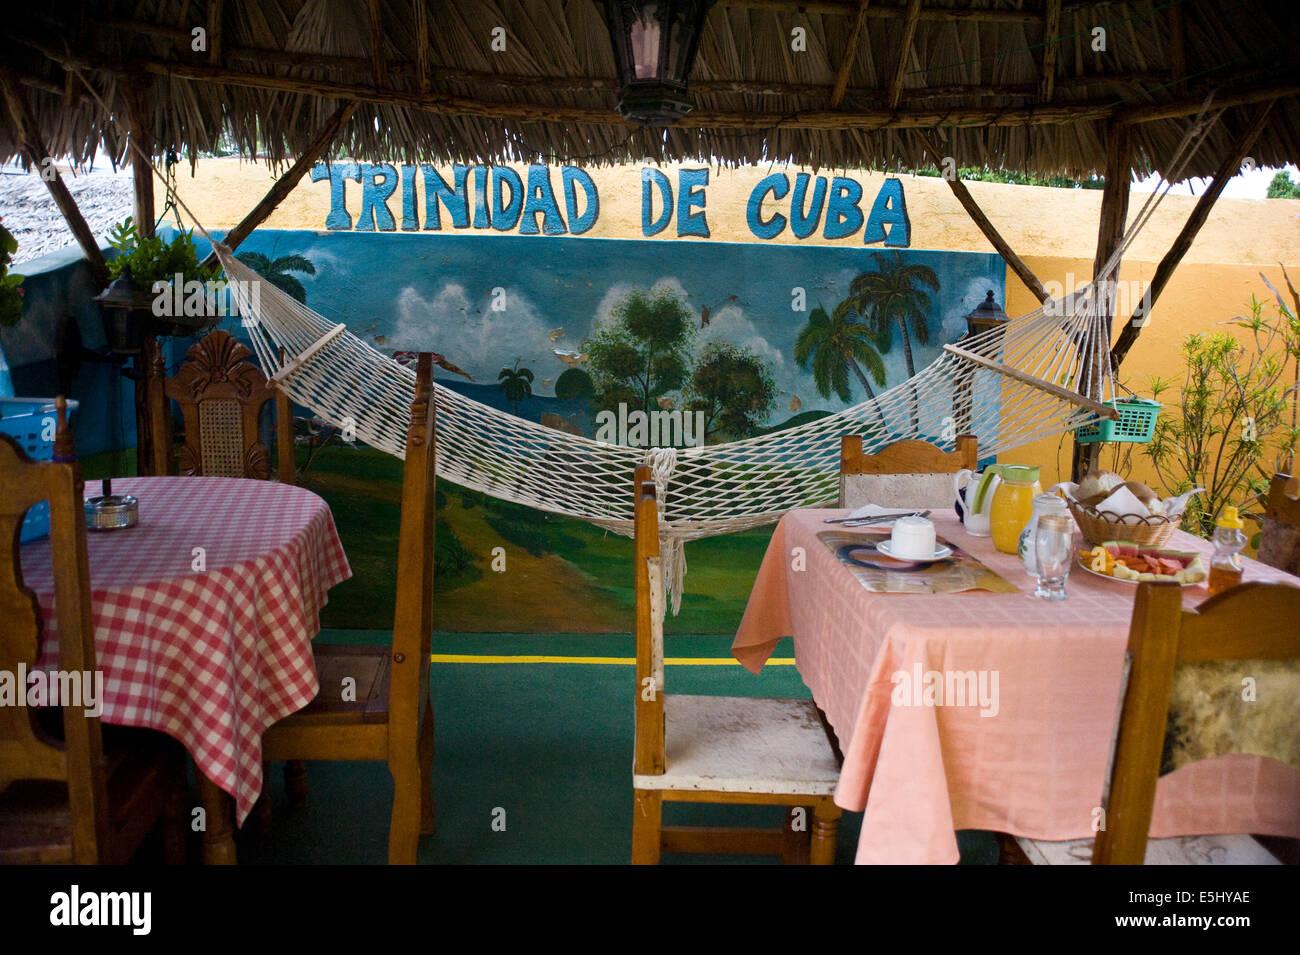 Breakfast setting at a Casa Particular (Bed & Breakfast) in Trinidad, Cuba - Stock Image